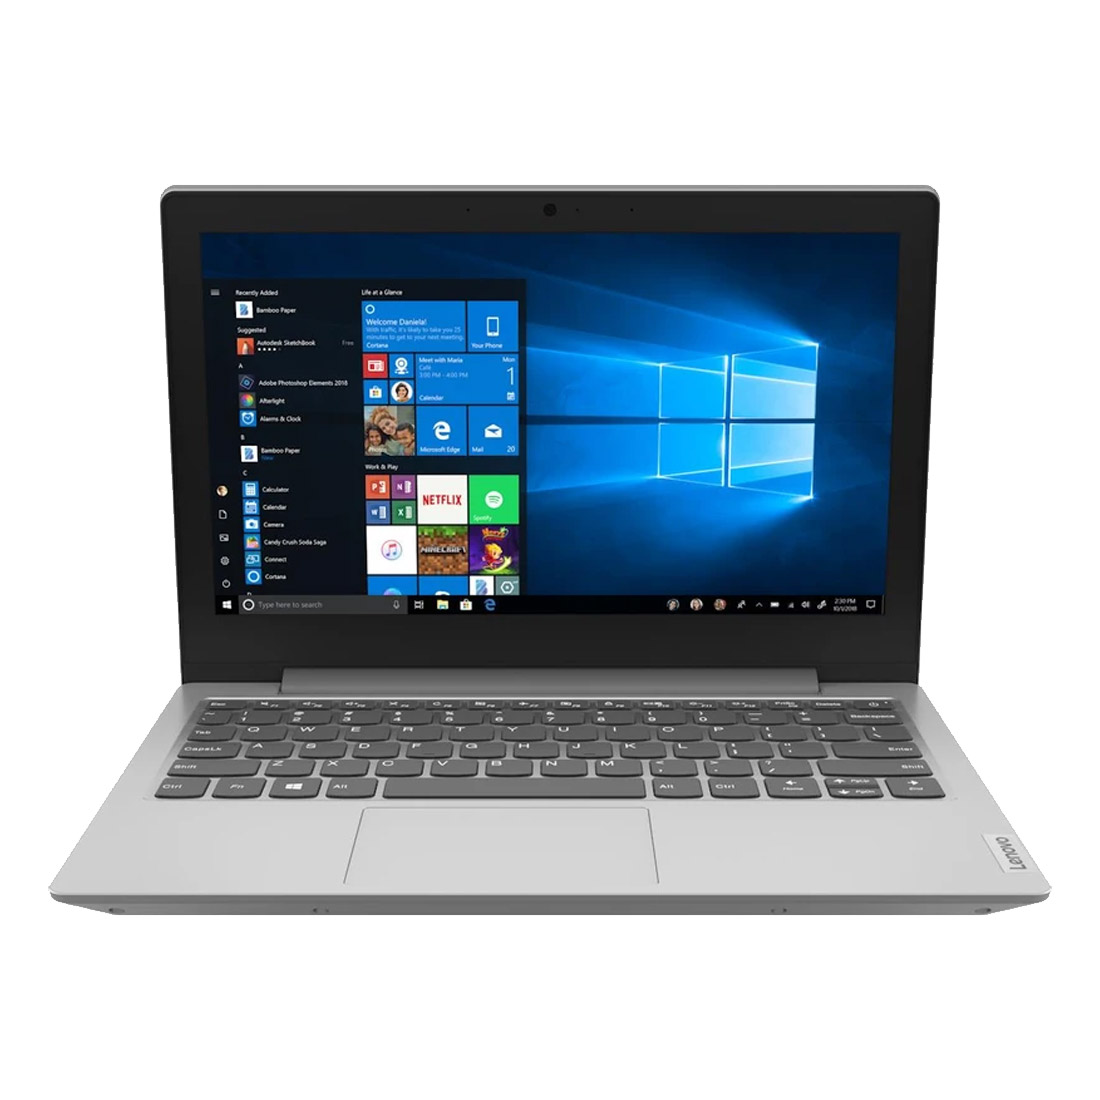 "Image of Lenovo IdeaPad 1 11IGL05 Notebook (Celeron, 11.6"", 64GB/4GB eMMC) - Grey"